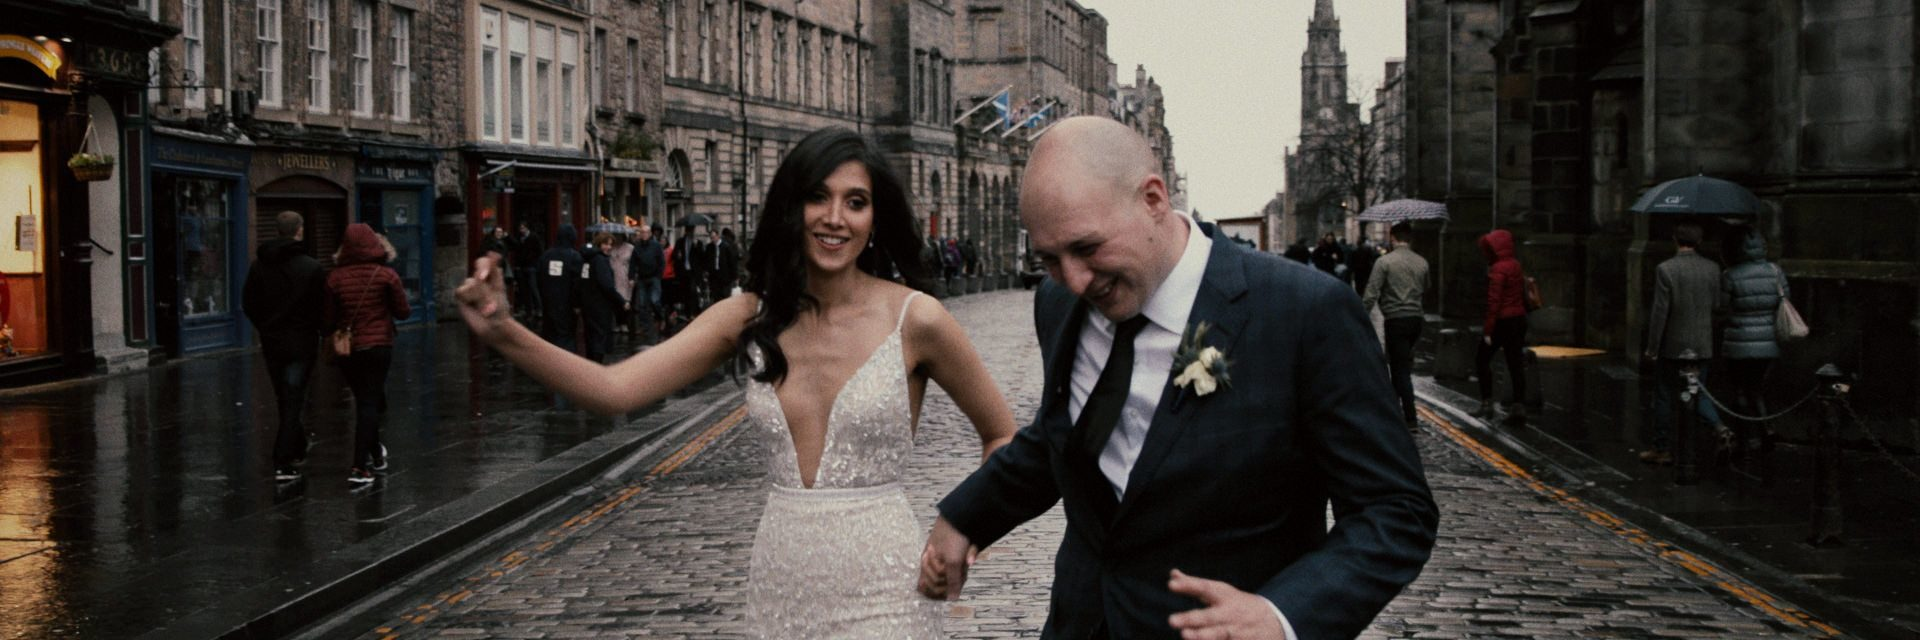 Barcelona-wedding-videographer-cinemate-films-04